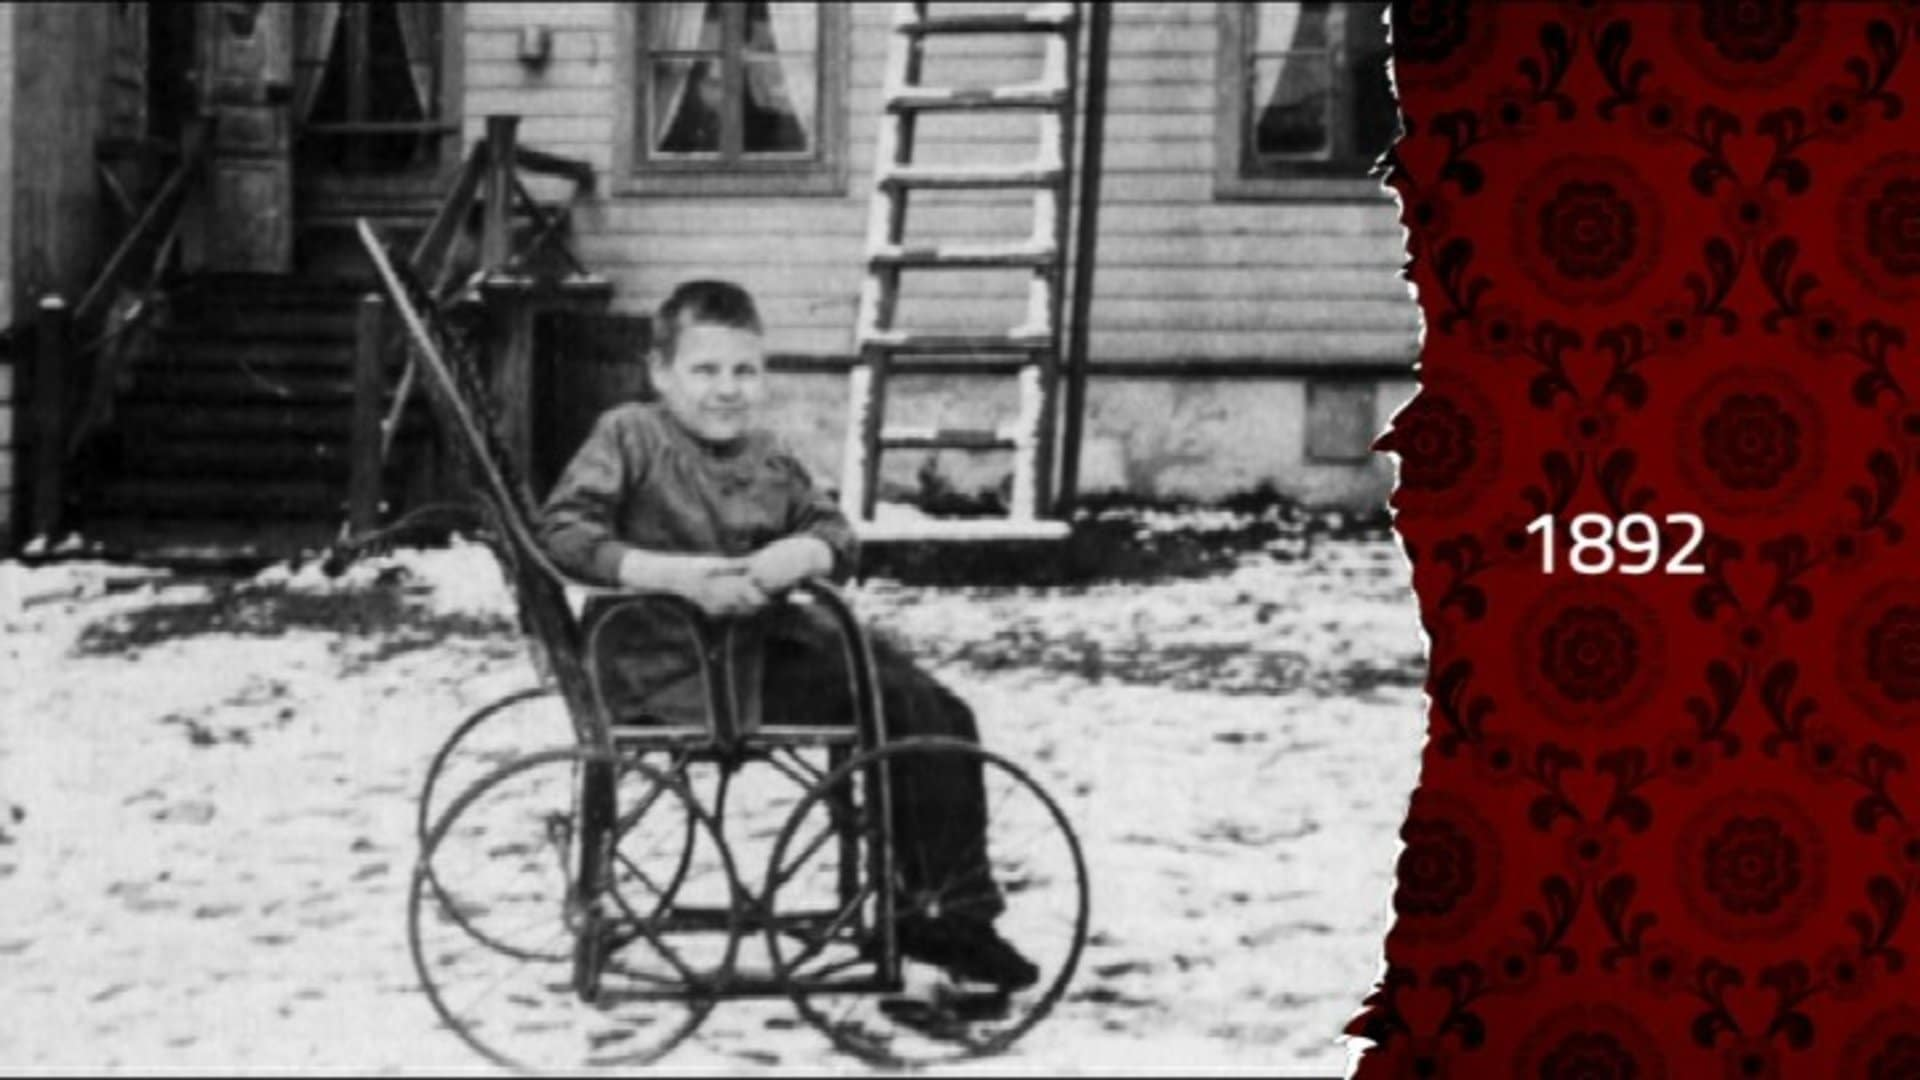 Arkistosta revittyä   Arkistosta revittyä: Pyörätuoli